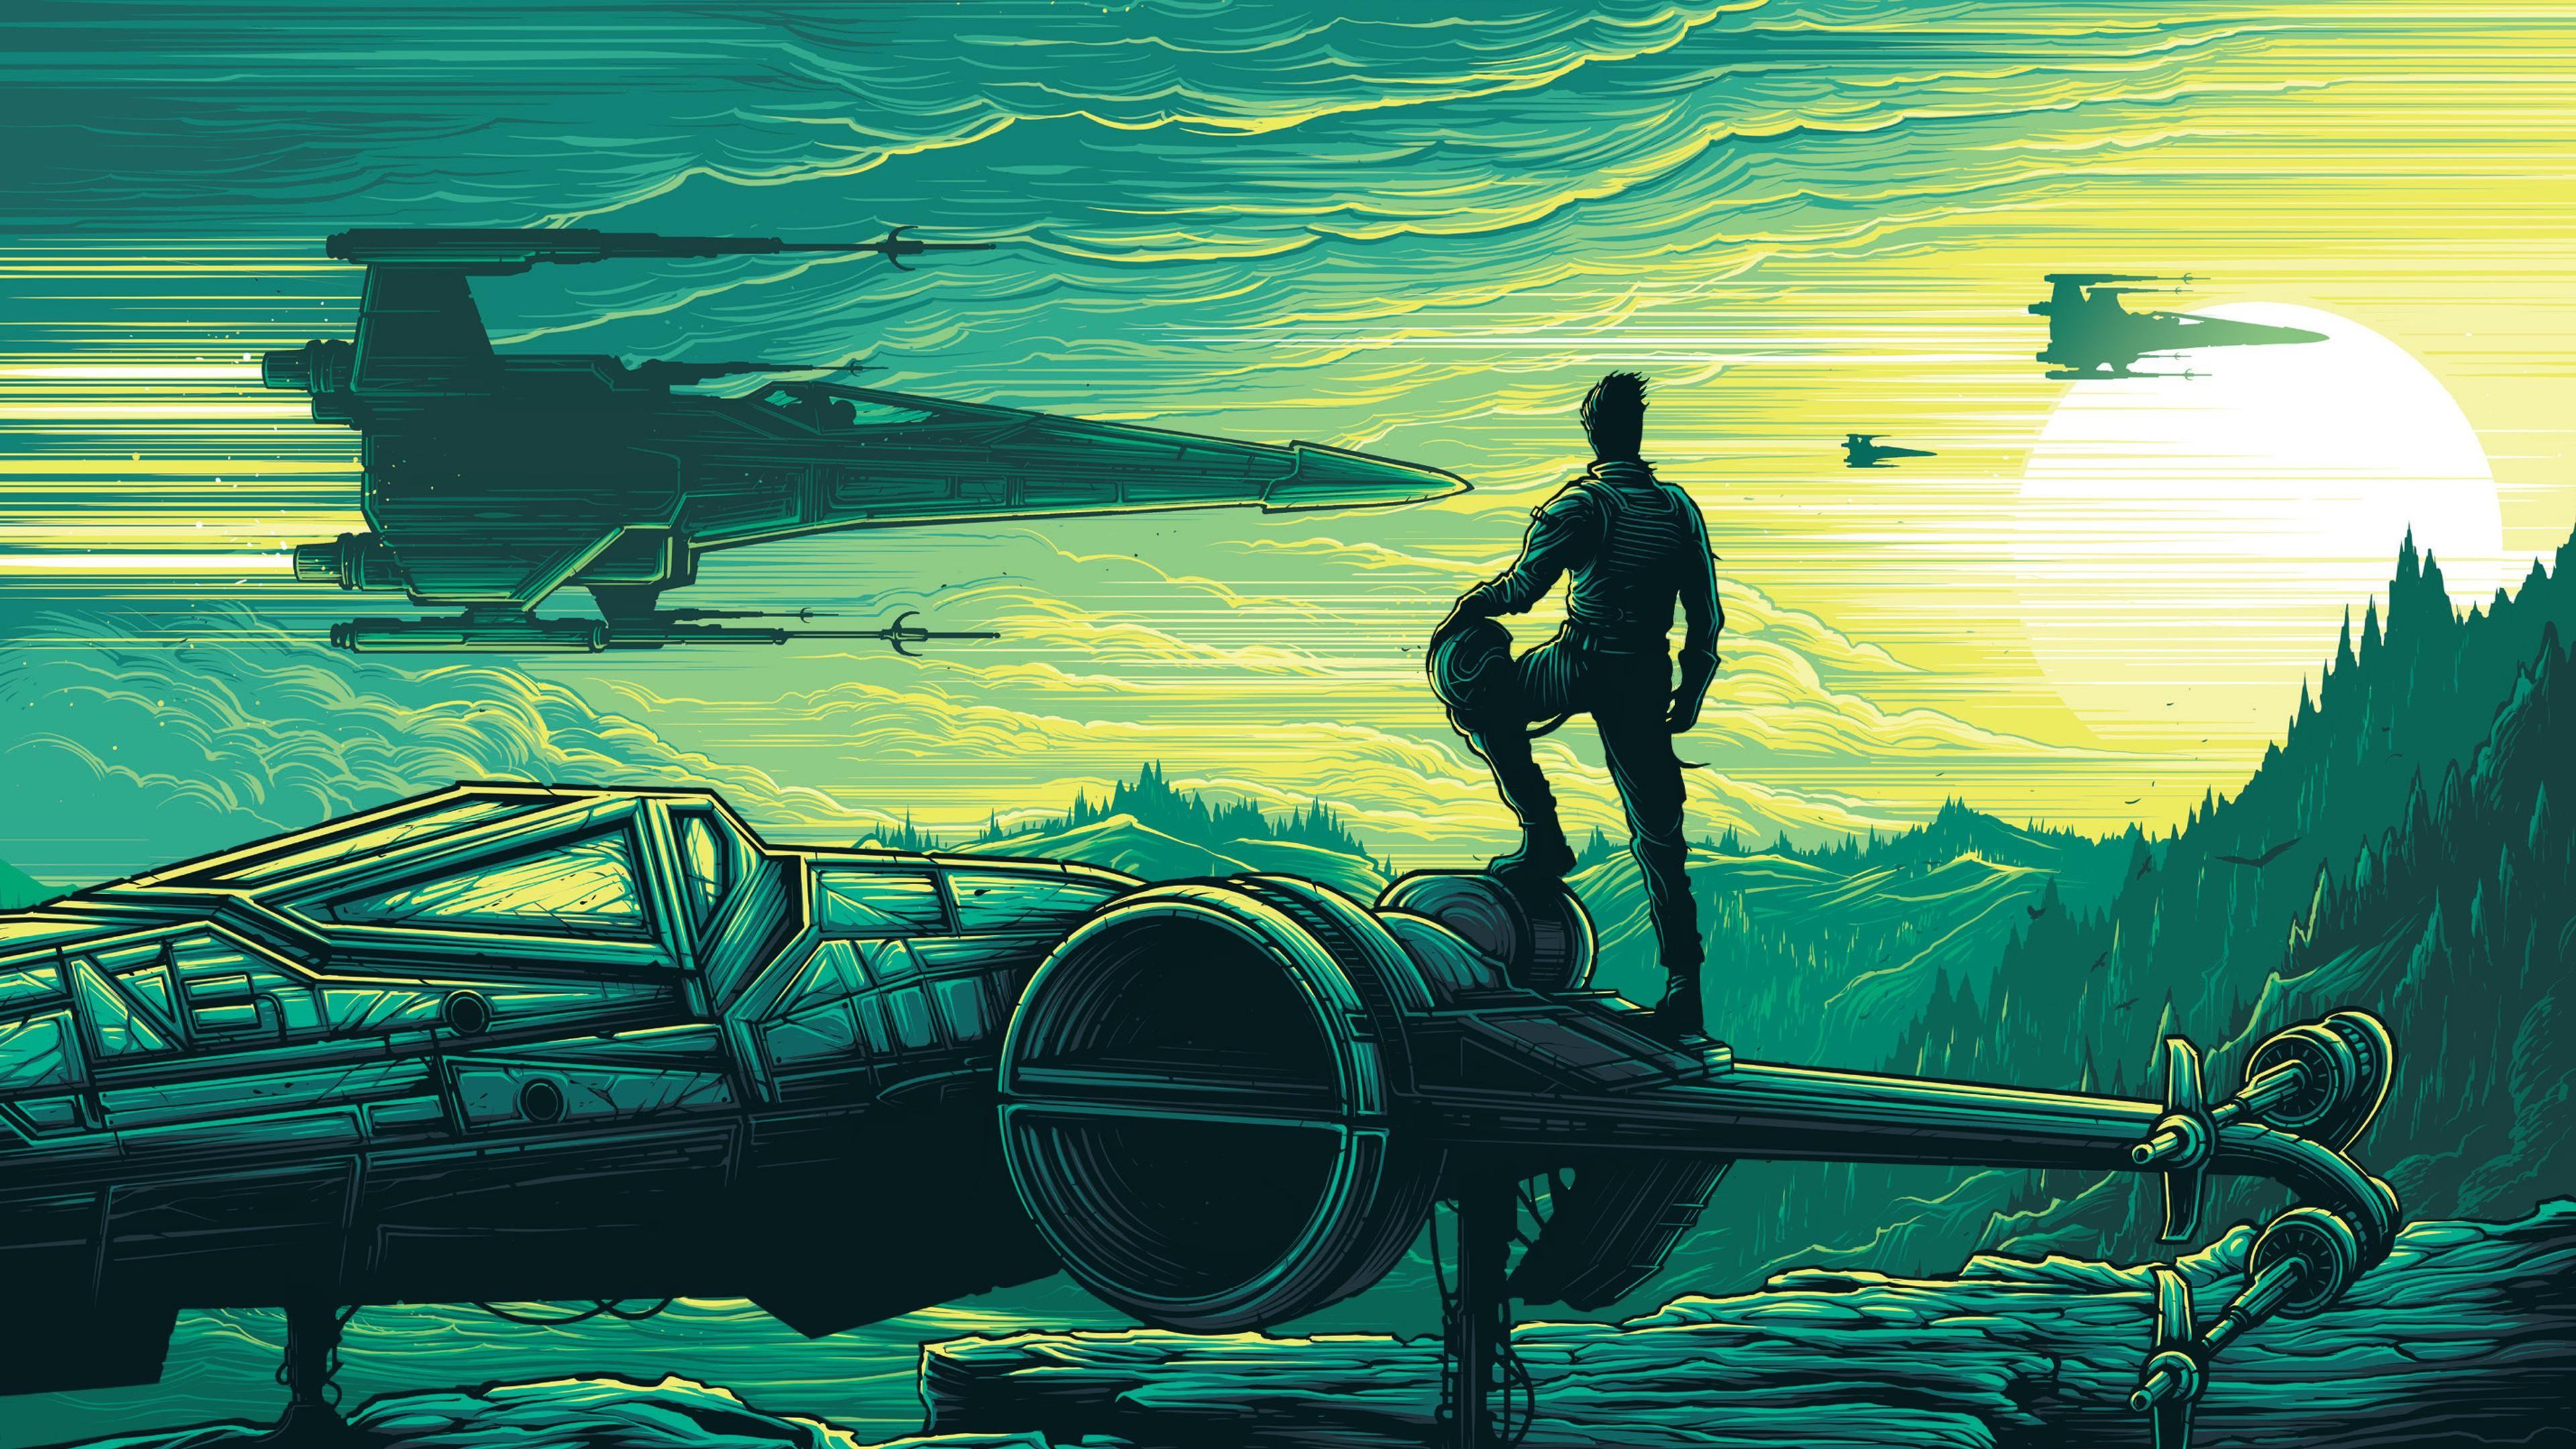 The Force Awakens Imax Wallpapers 3840x2160 4k Imgur Force Awakens Poster Star Wars Wallpaper Star Wars Poster